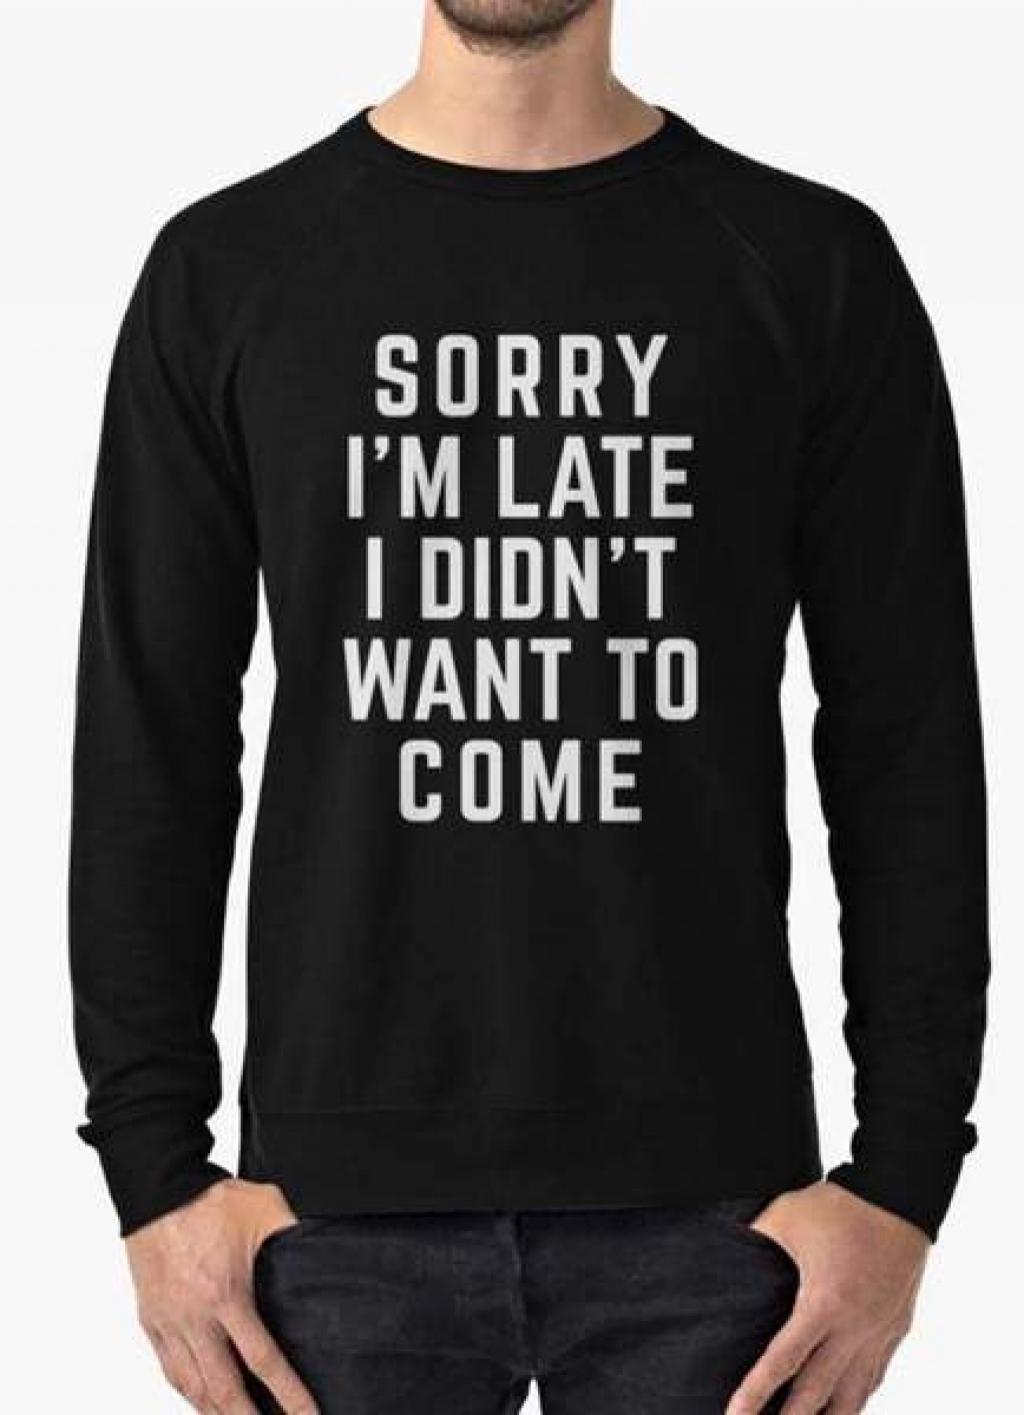 15409169050_manahil-sweat-shirt-sorry-i-m-late-sweat-shirt-3908030103640_grande.jpg